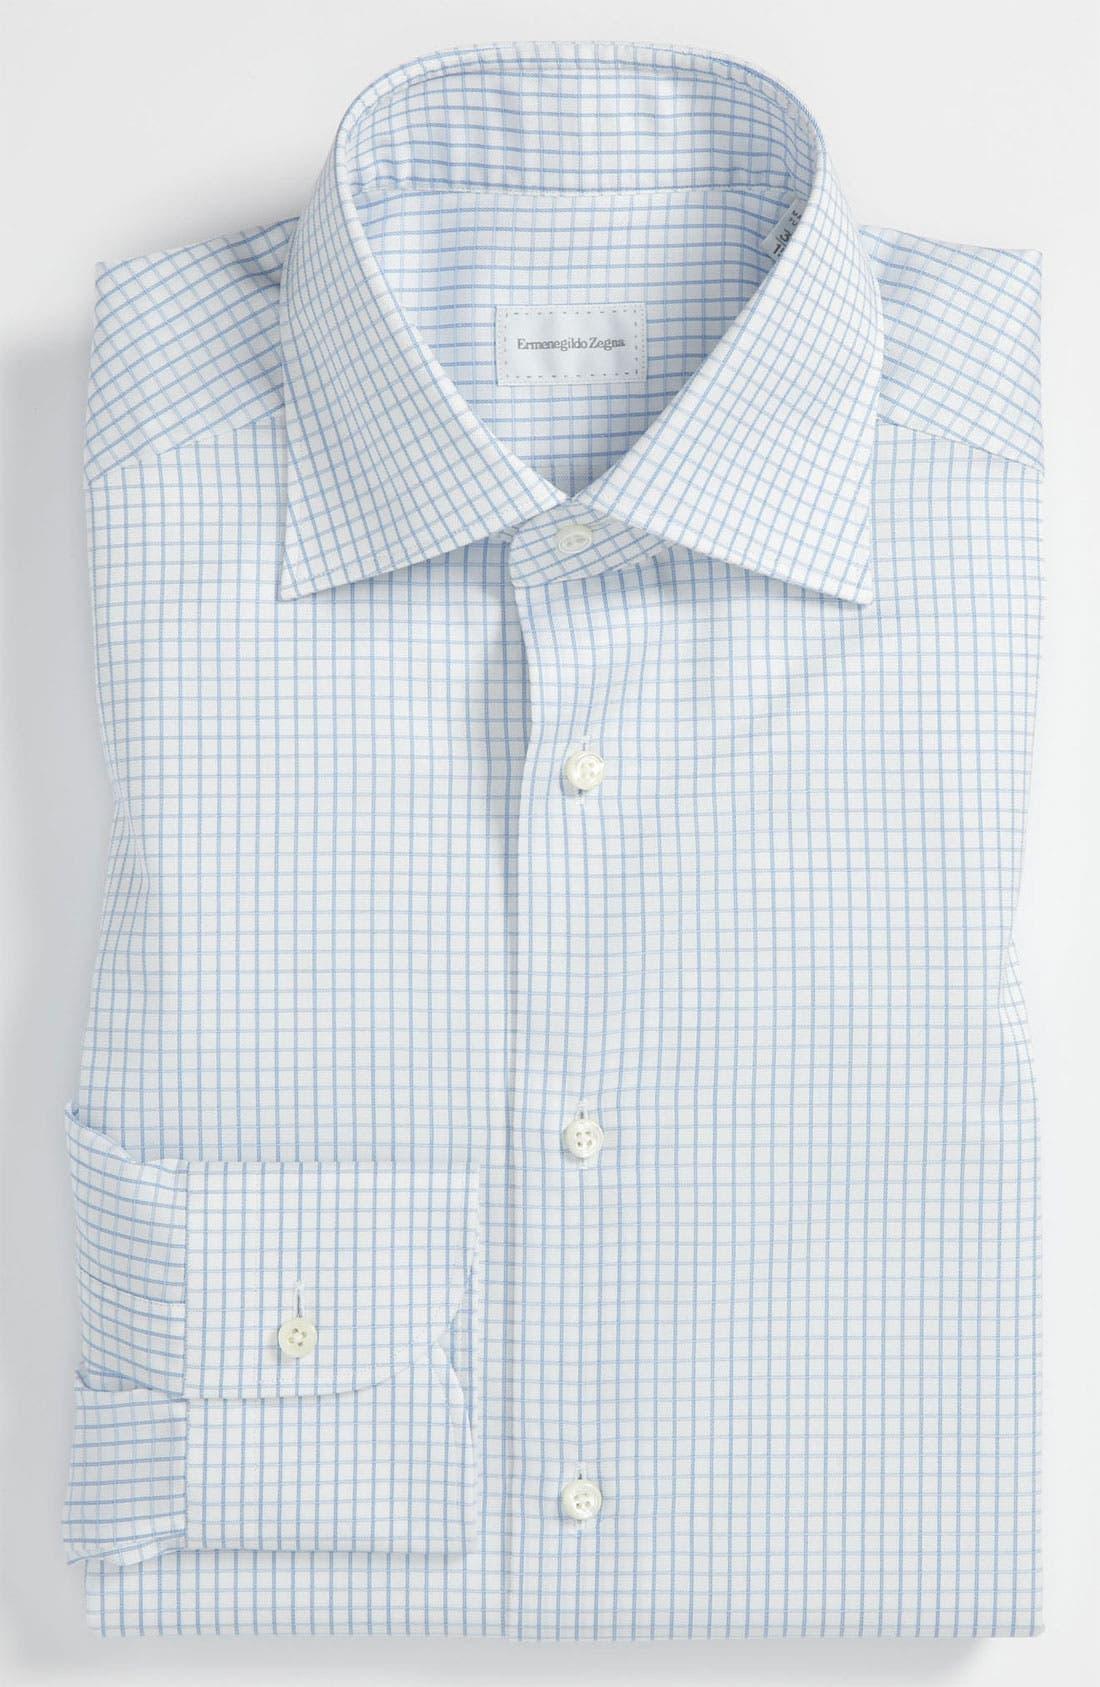 Regular Fit Dress Shirt,                         Main,                         color, 436